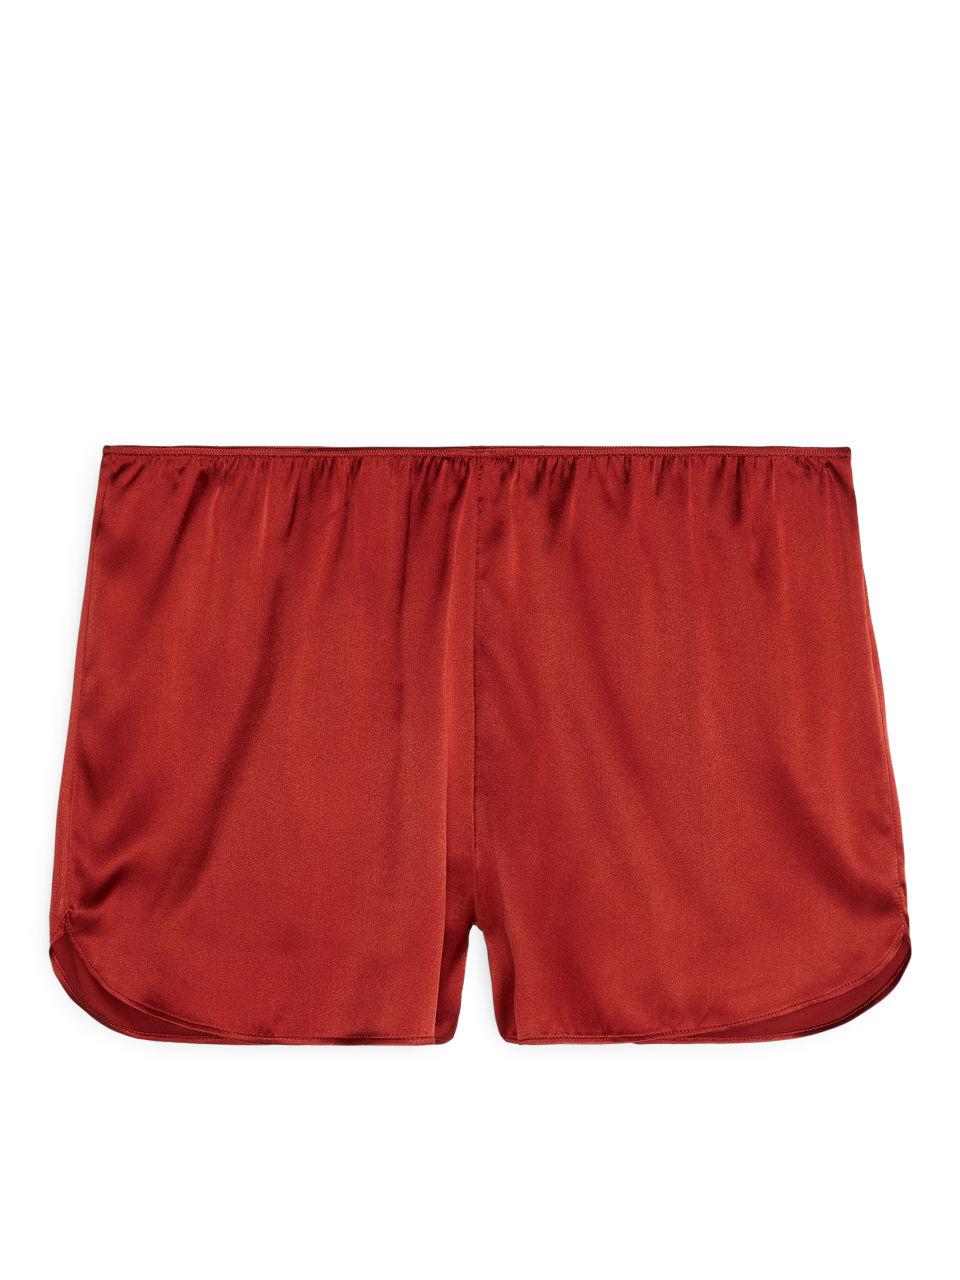 Silk Shorts - Orange